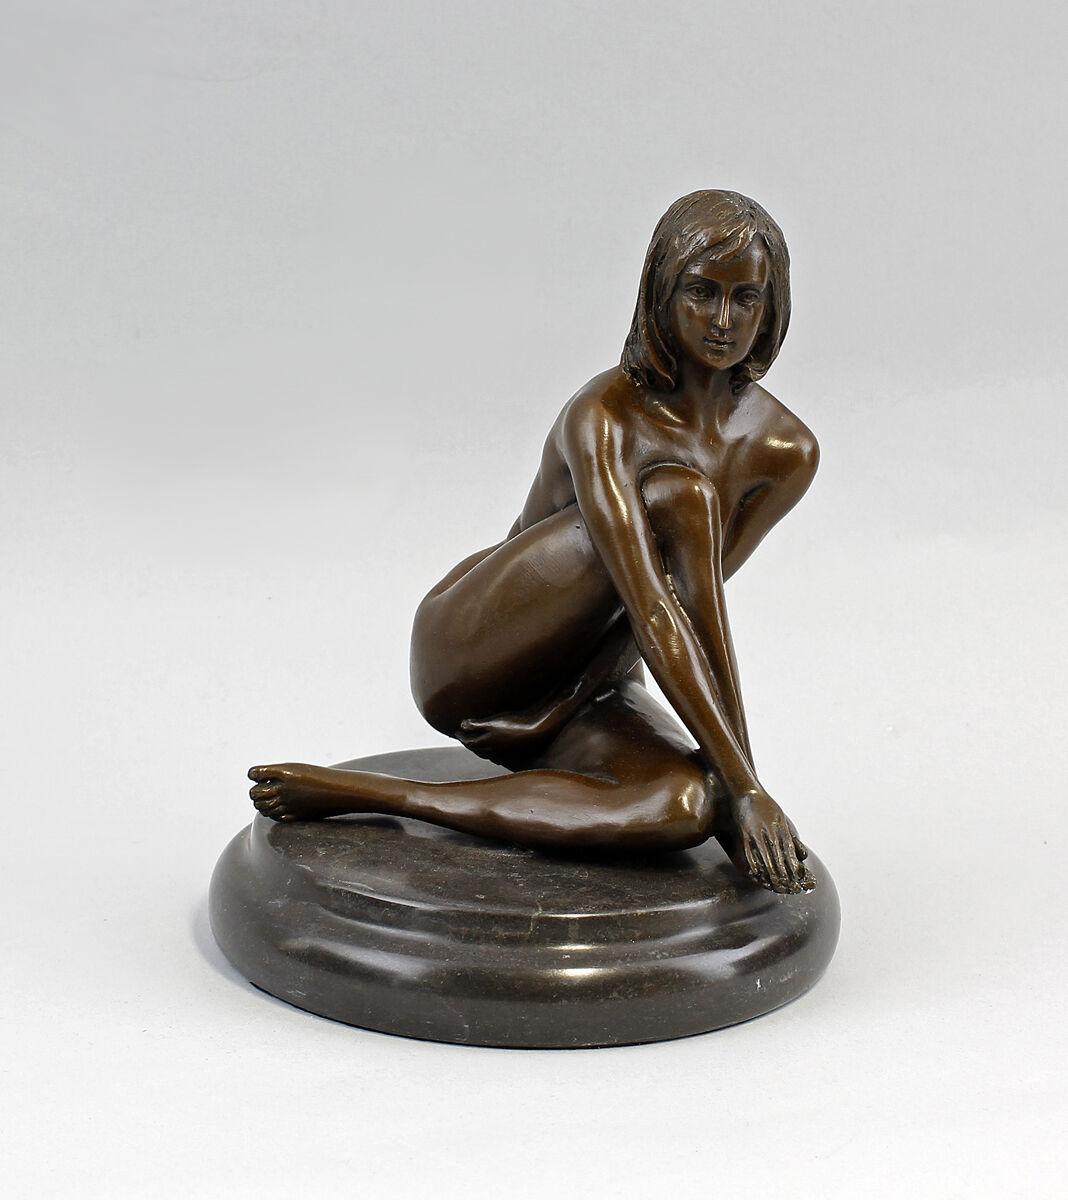 9937747 escultura de bronce femenina acto sentado sign. claude erojoismo 18x14cm